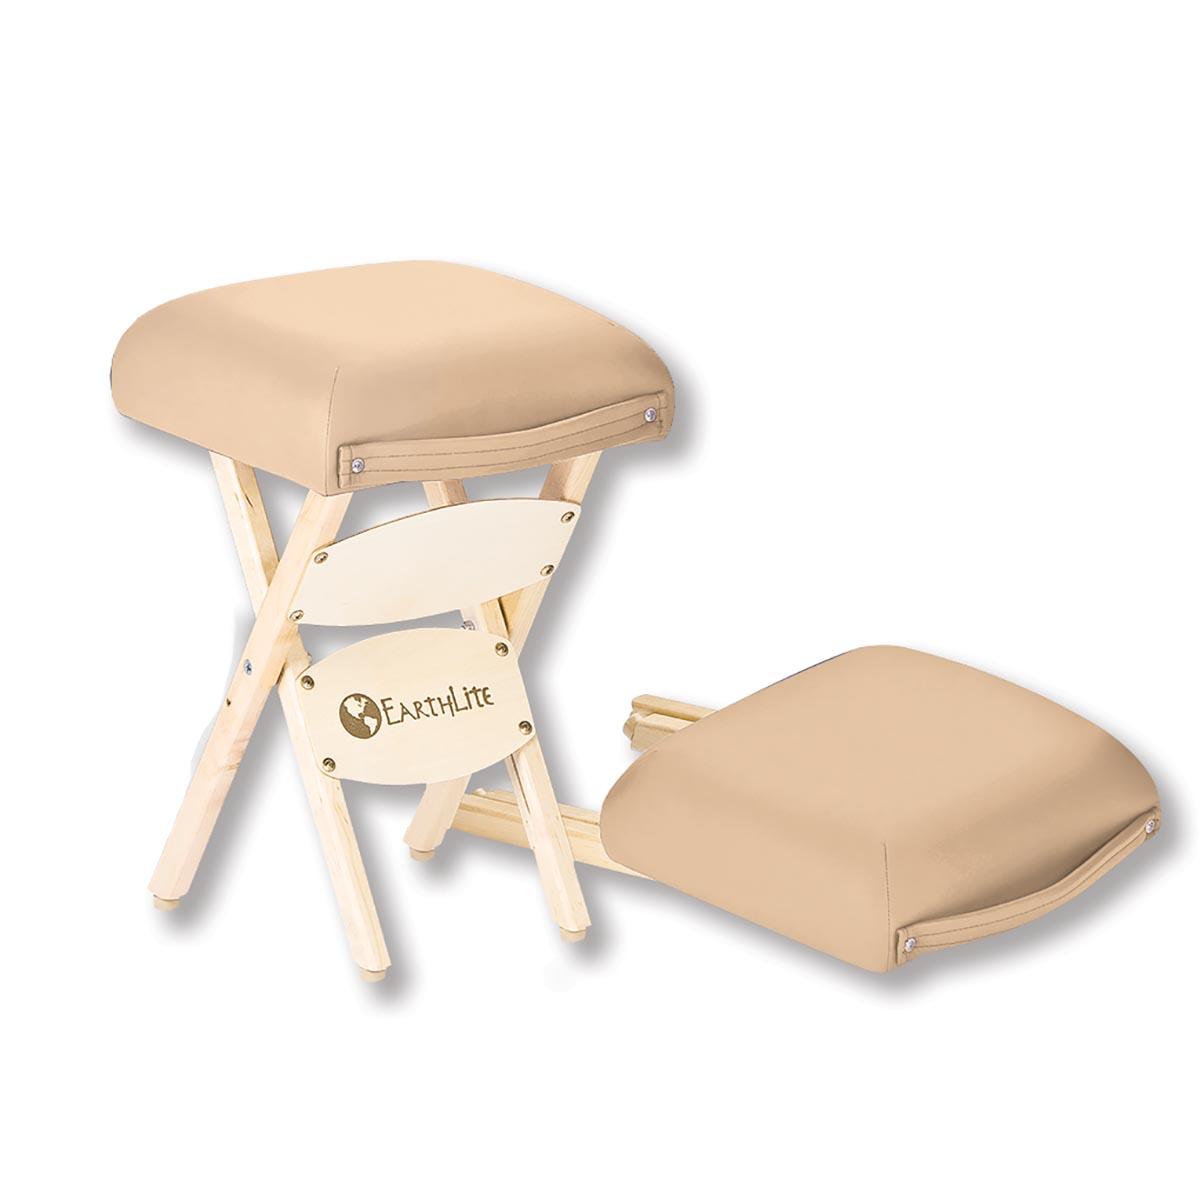 Earthlite Folding Massage Stool | Stools